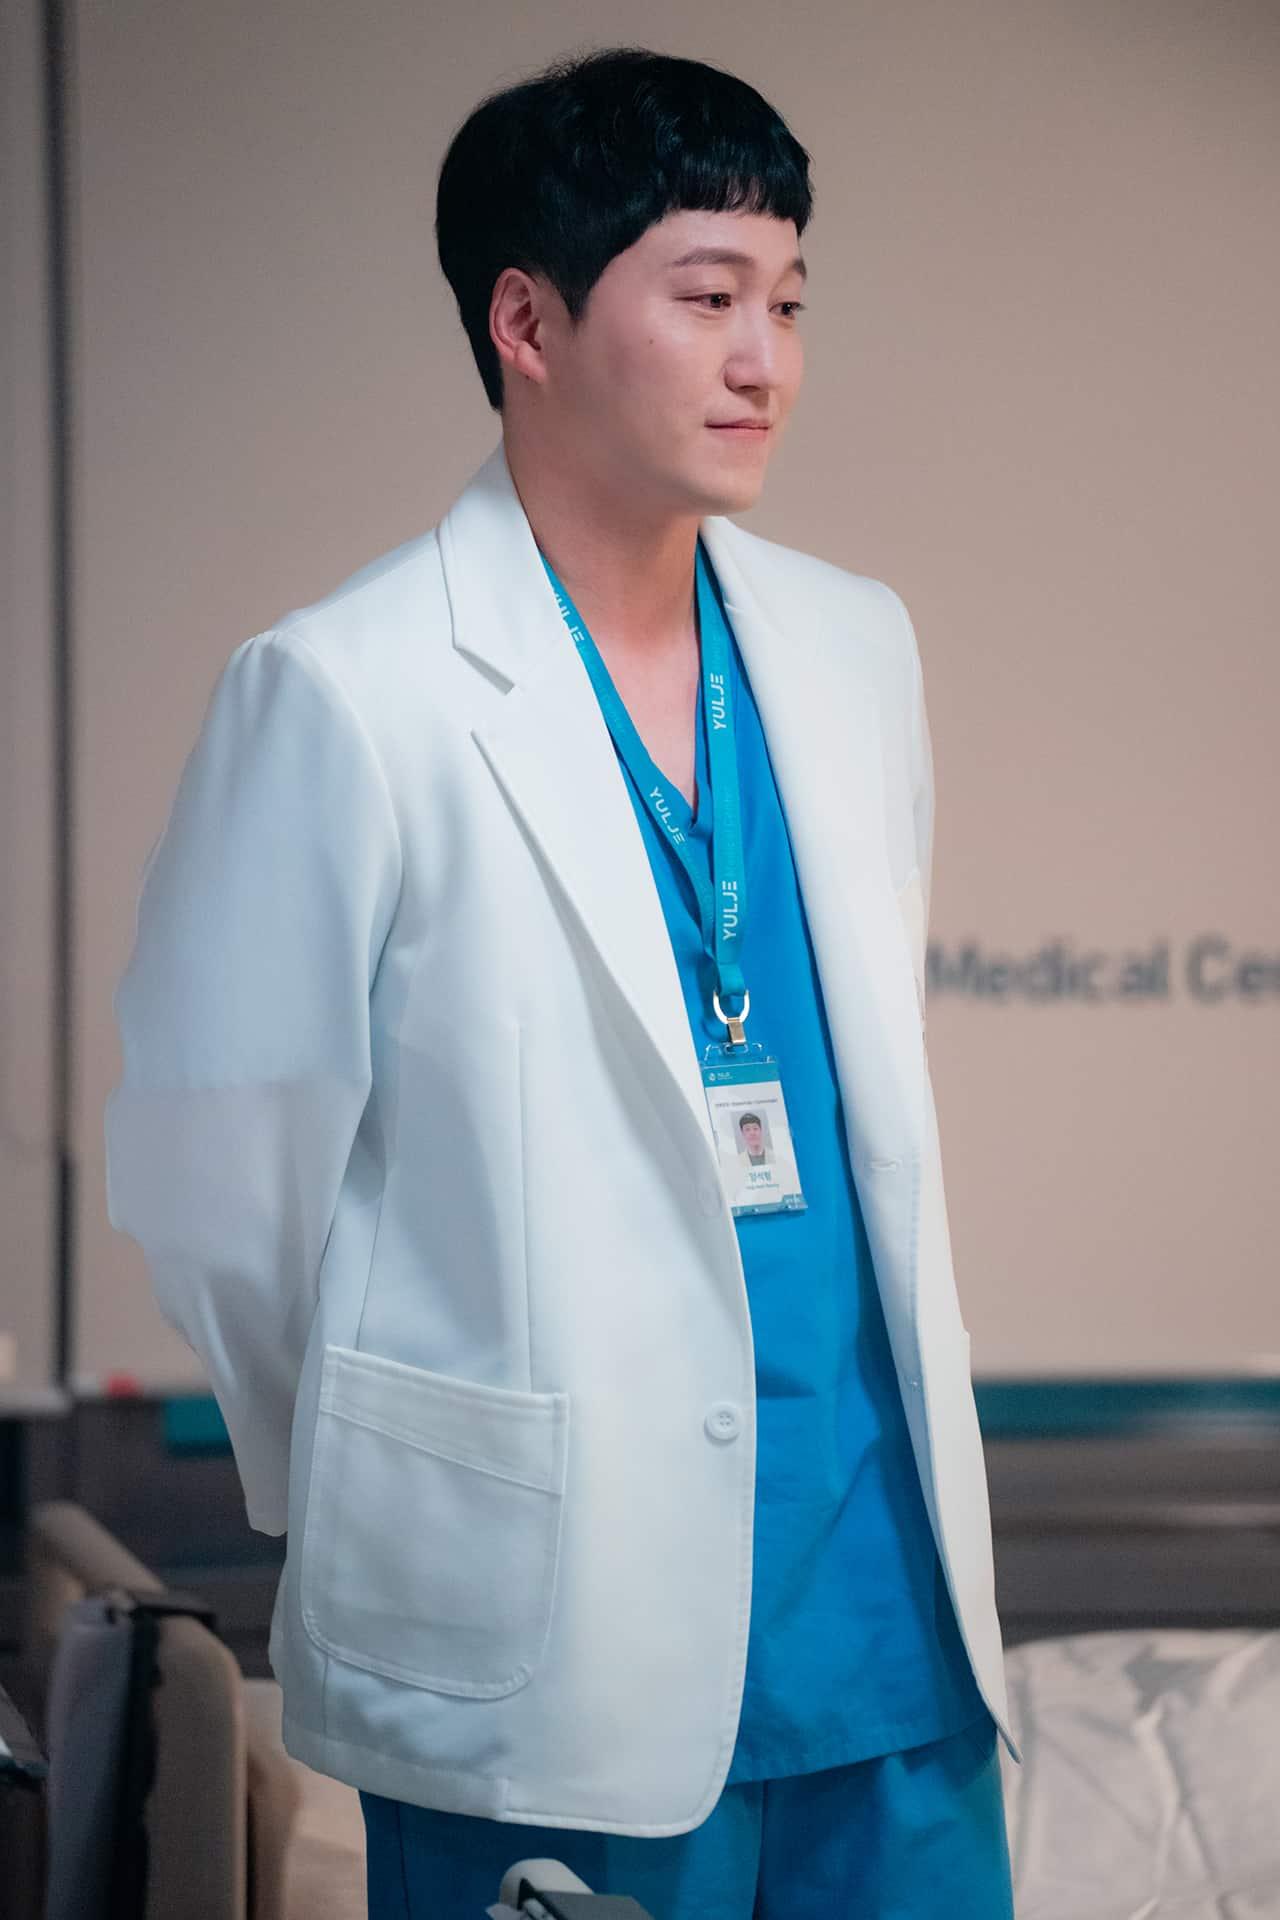 Guide to the Hospital Playlist Season 2 characters: Yang Seok Hyeong